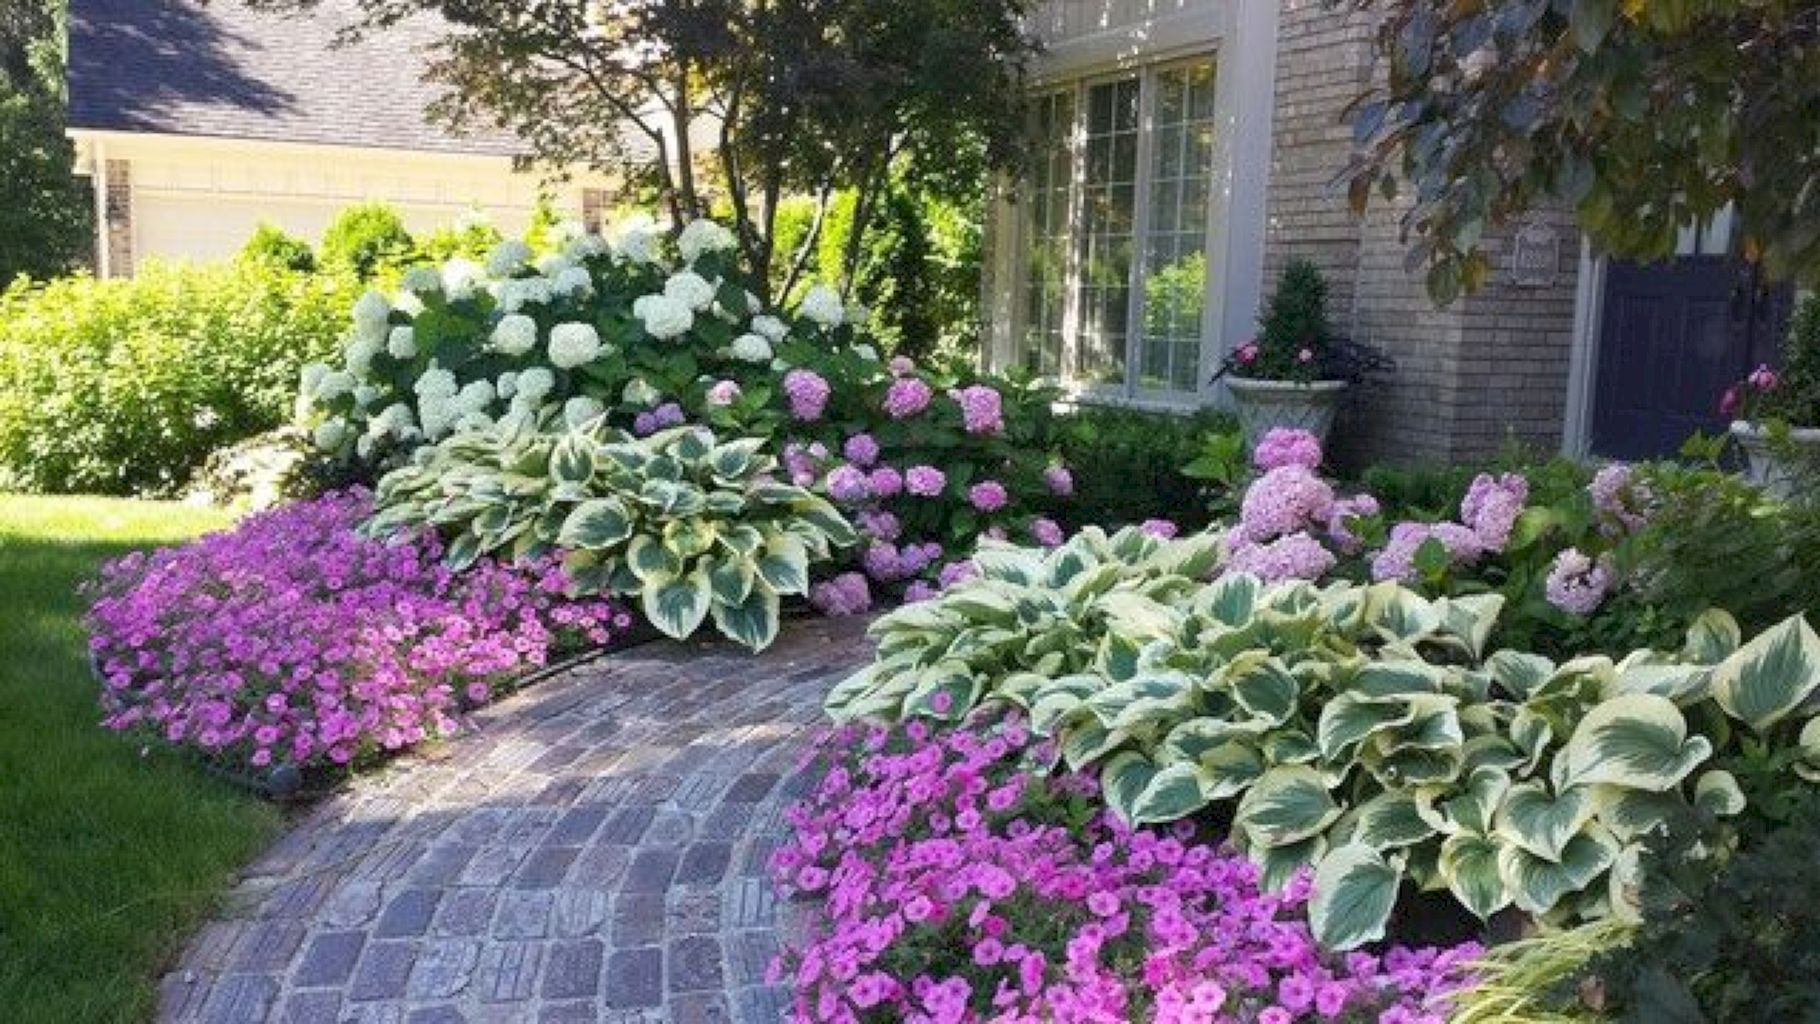 Stunning Front Yard Landscaping Ideas 40 Front Yard Landscaping Design Hydrangea Landscaping Front Yard Garden